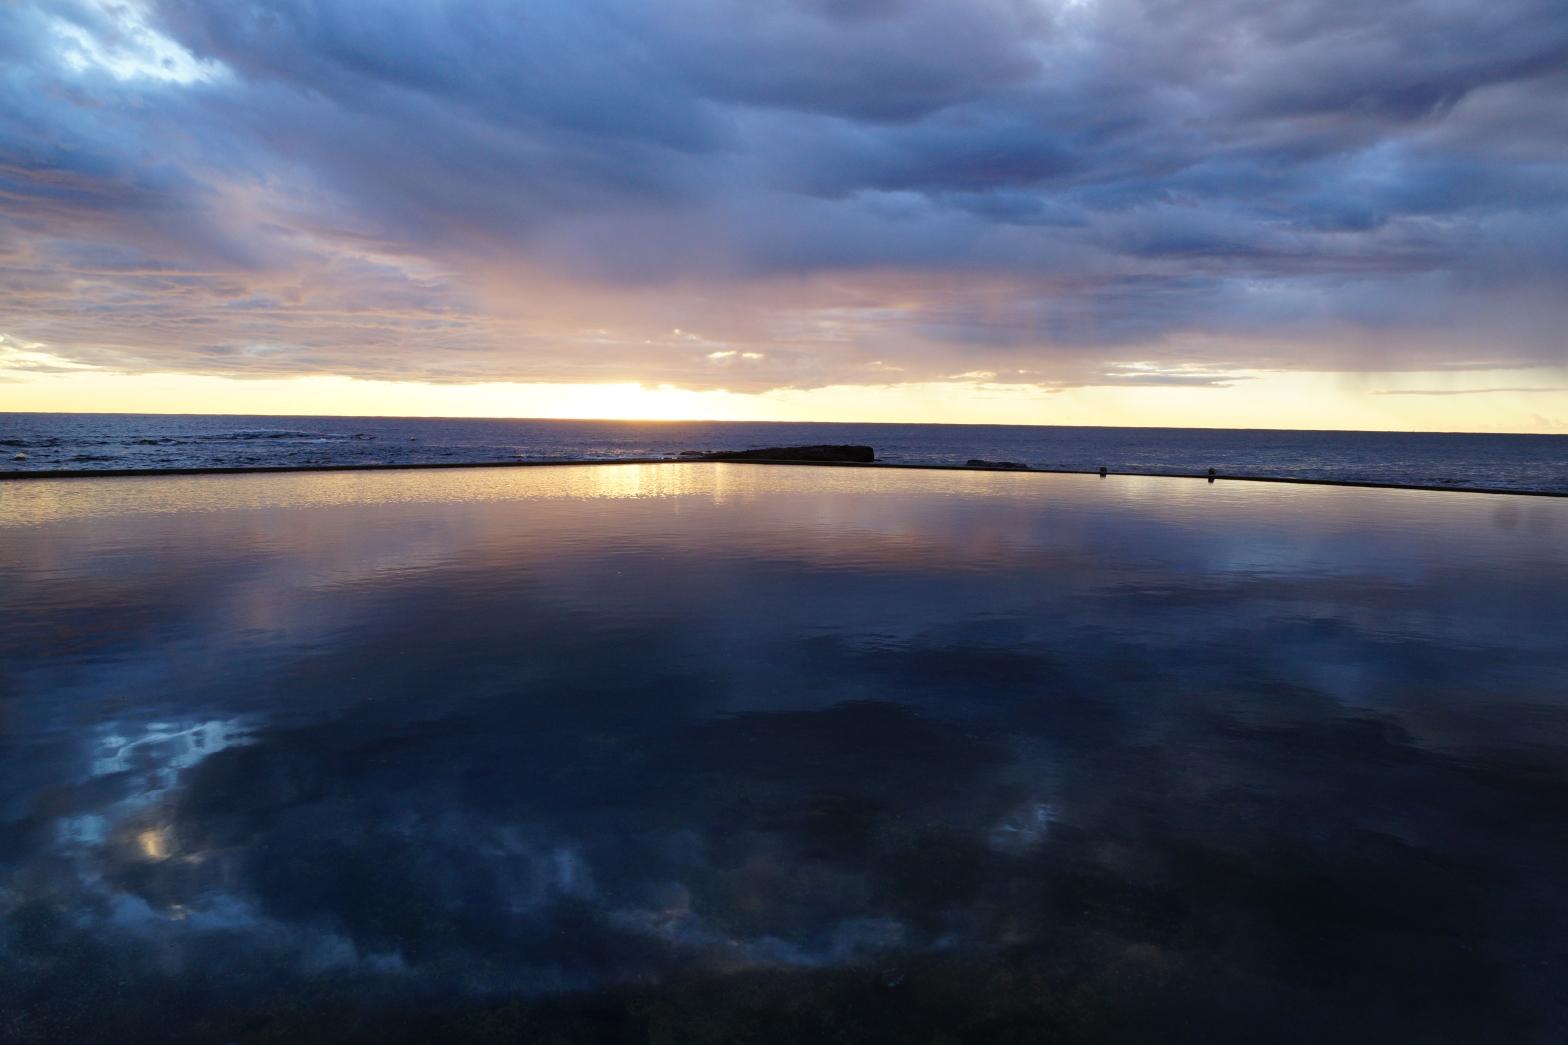 Kiama, NSW, Australia